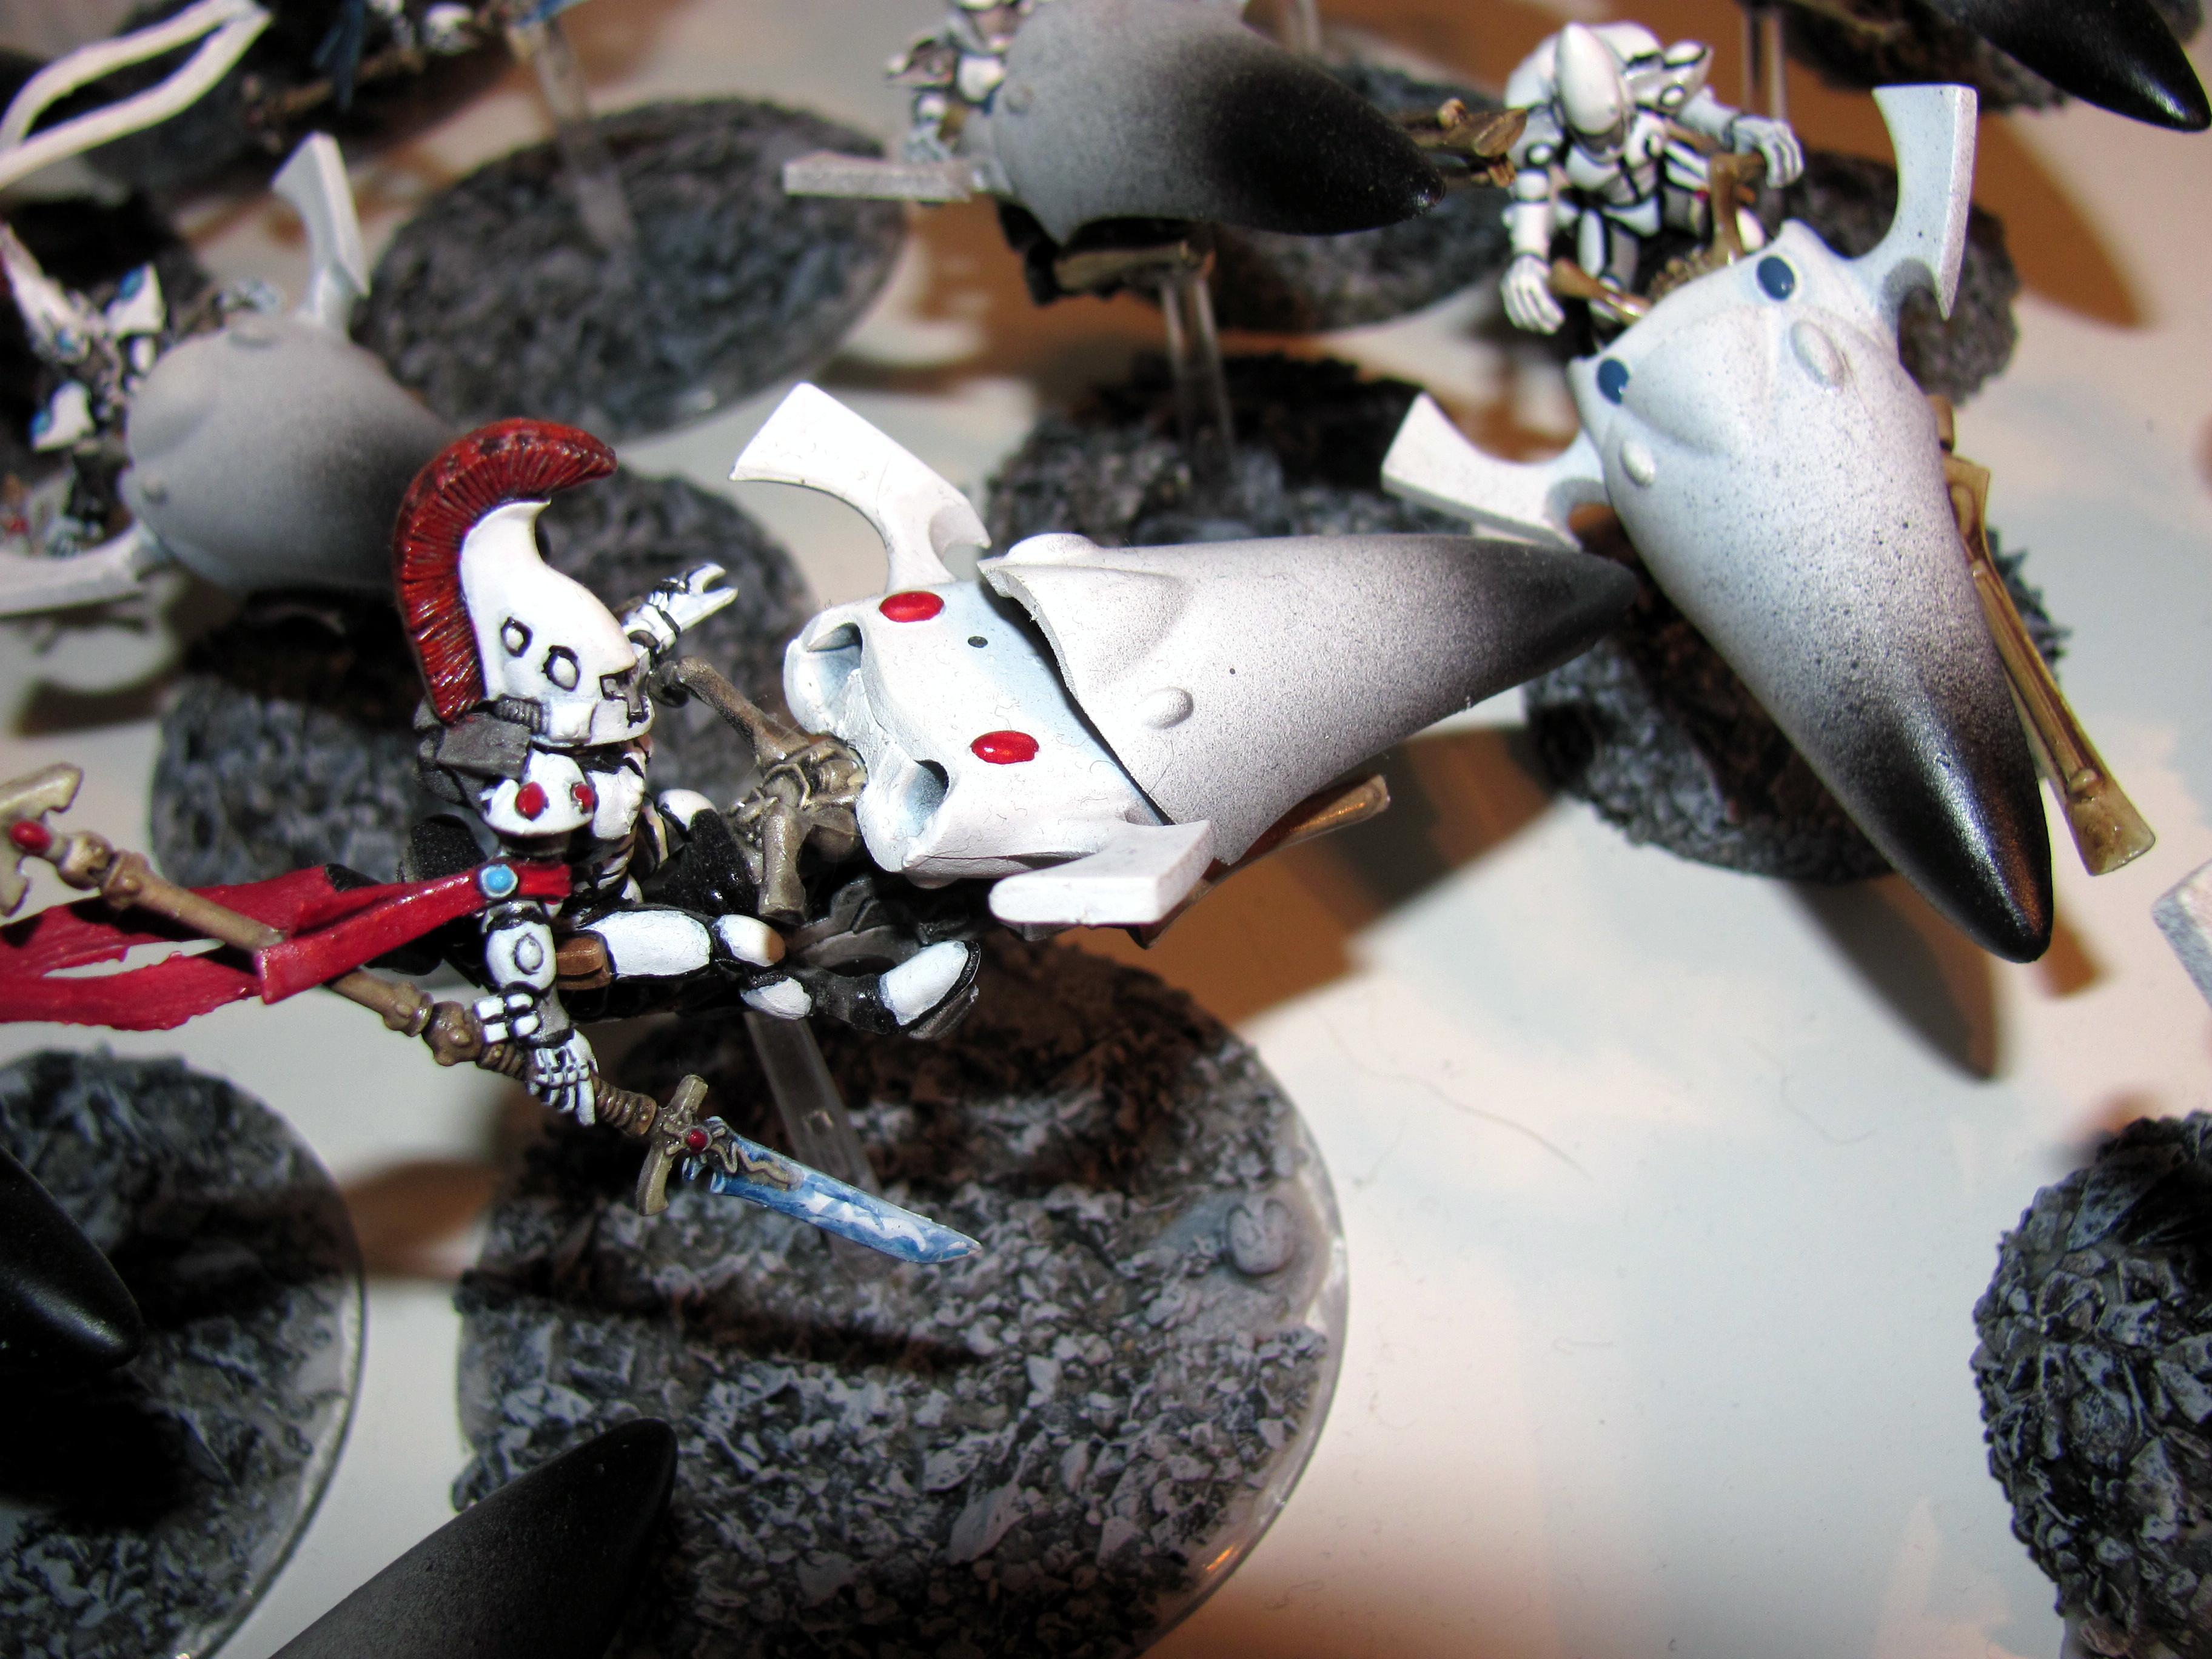 Eldar, Jetbike, Seer Council, Warhammer 40,000, Warlock